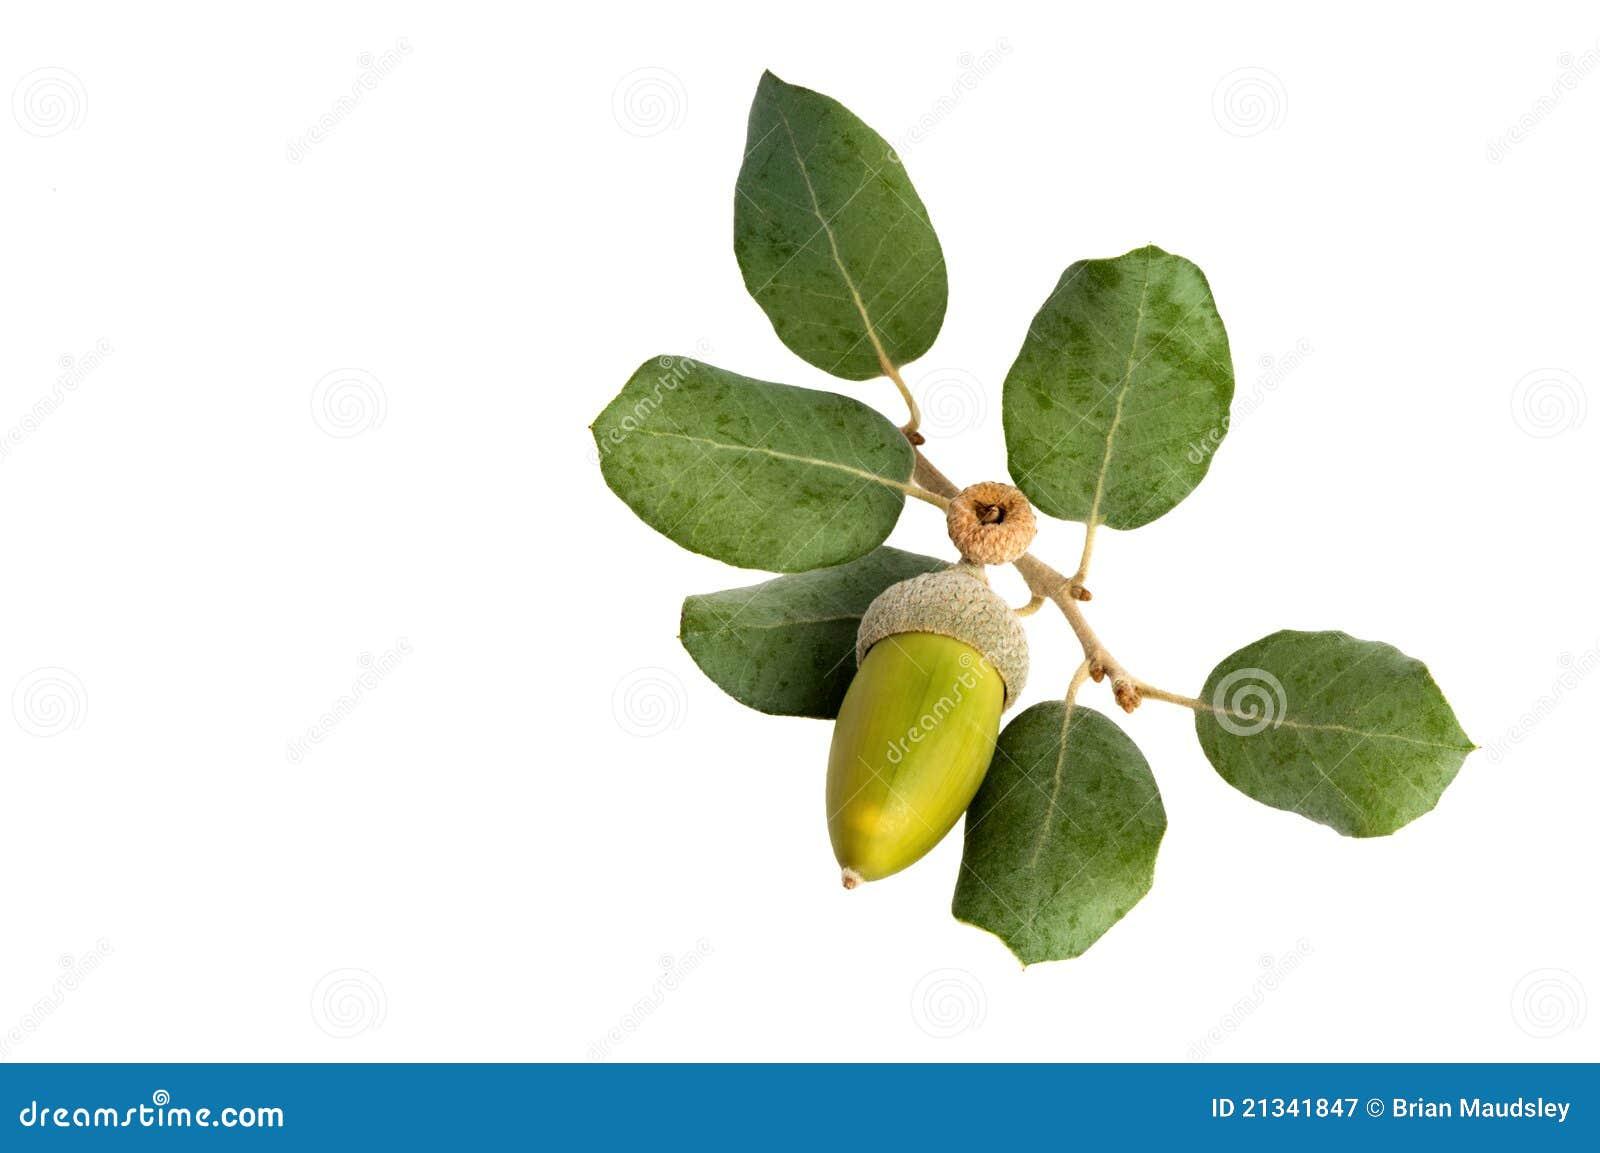 Oak Leaf And Acorn Drawing Acorn and Holly Oak leaves